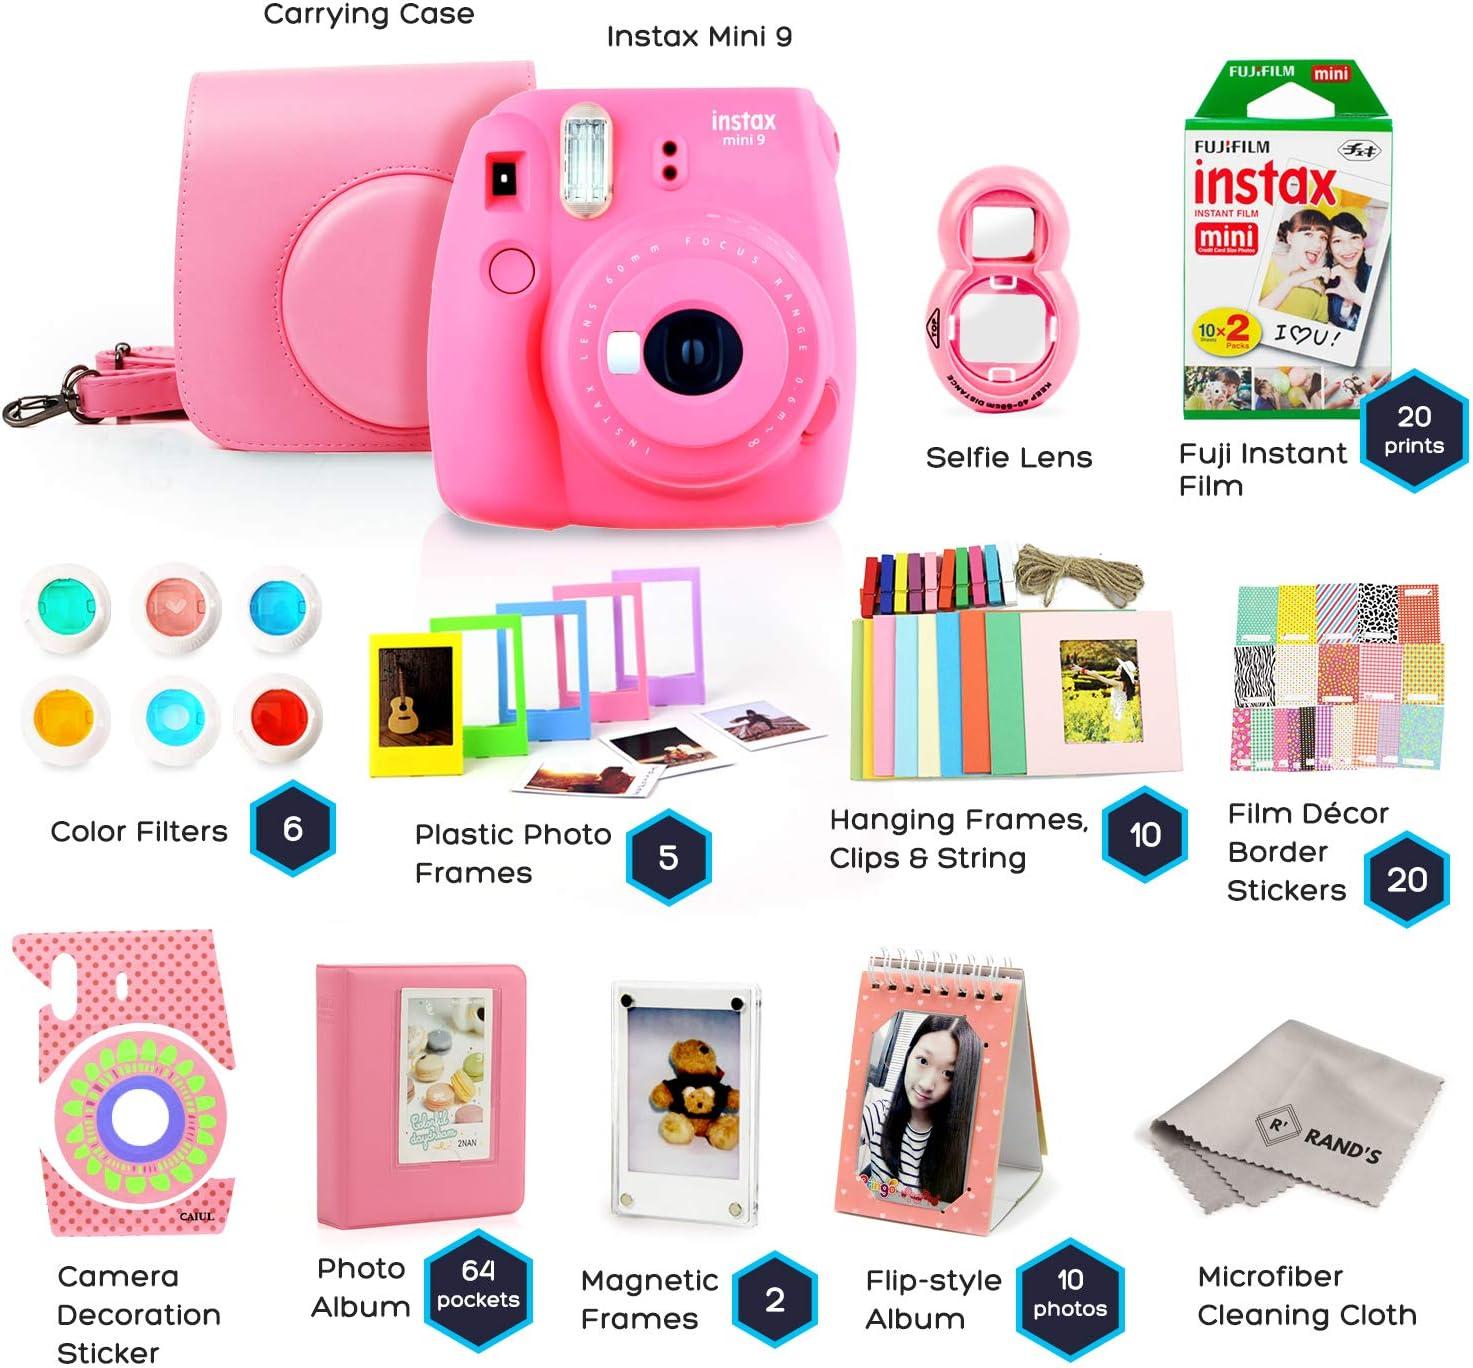 Carry Case 6 Color Filters + 11-in-1 Accessory Bundle 2 Photo Albums 20 Sheets Assorted Frames - Fuji Camera Instant Film Fujifilm Instax Mini 9 Bundle Cobalt Blue Selfie Lens /& Much More